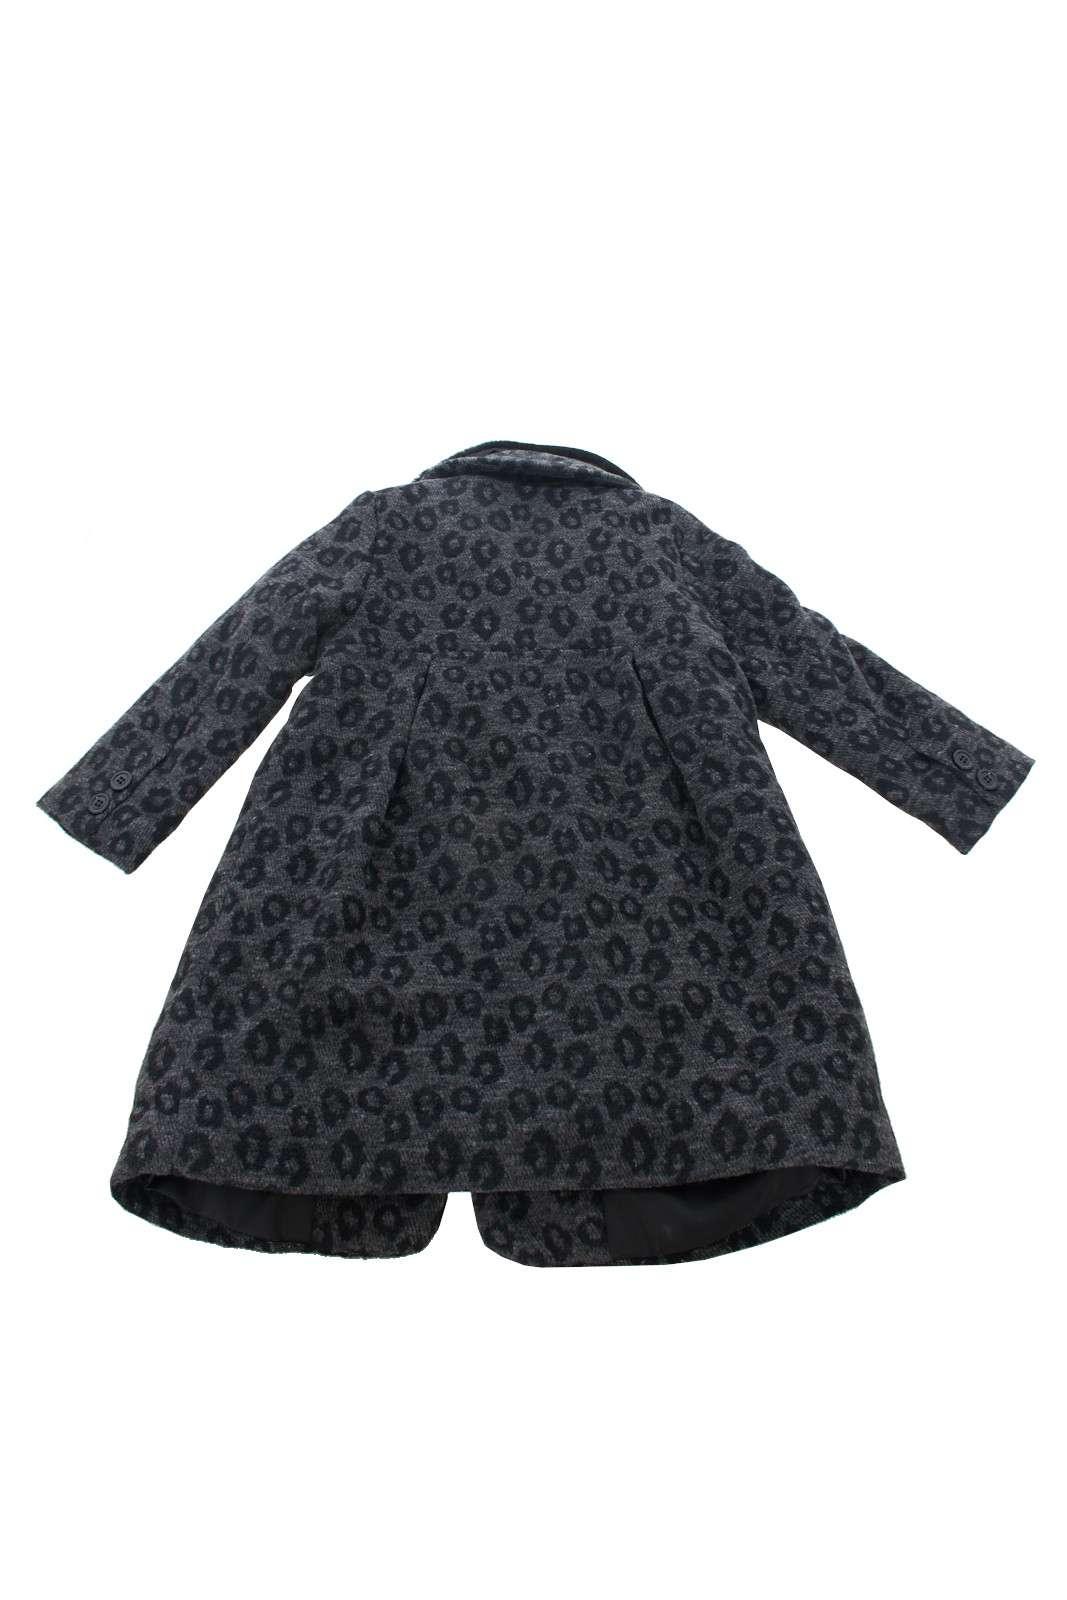 https://www.parmax.com/media/catalog/product/a/i/AI-outlet_parmax-cappotto-bambina-Ido-4T985-B.jpg